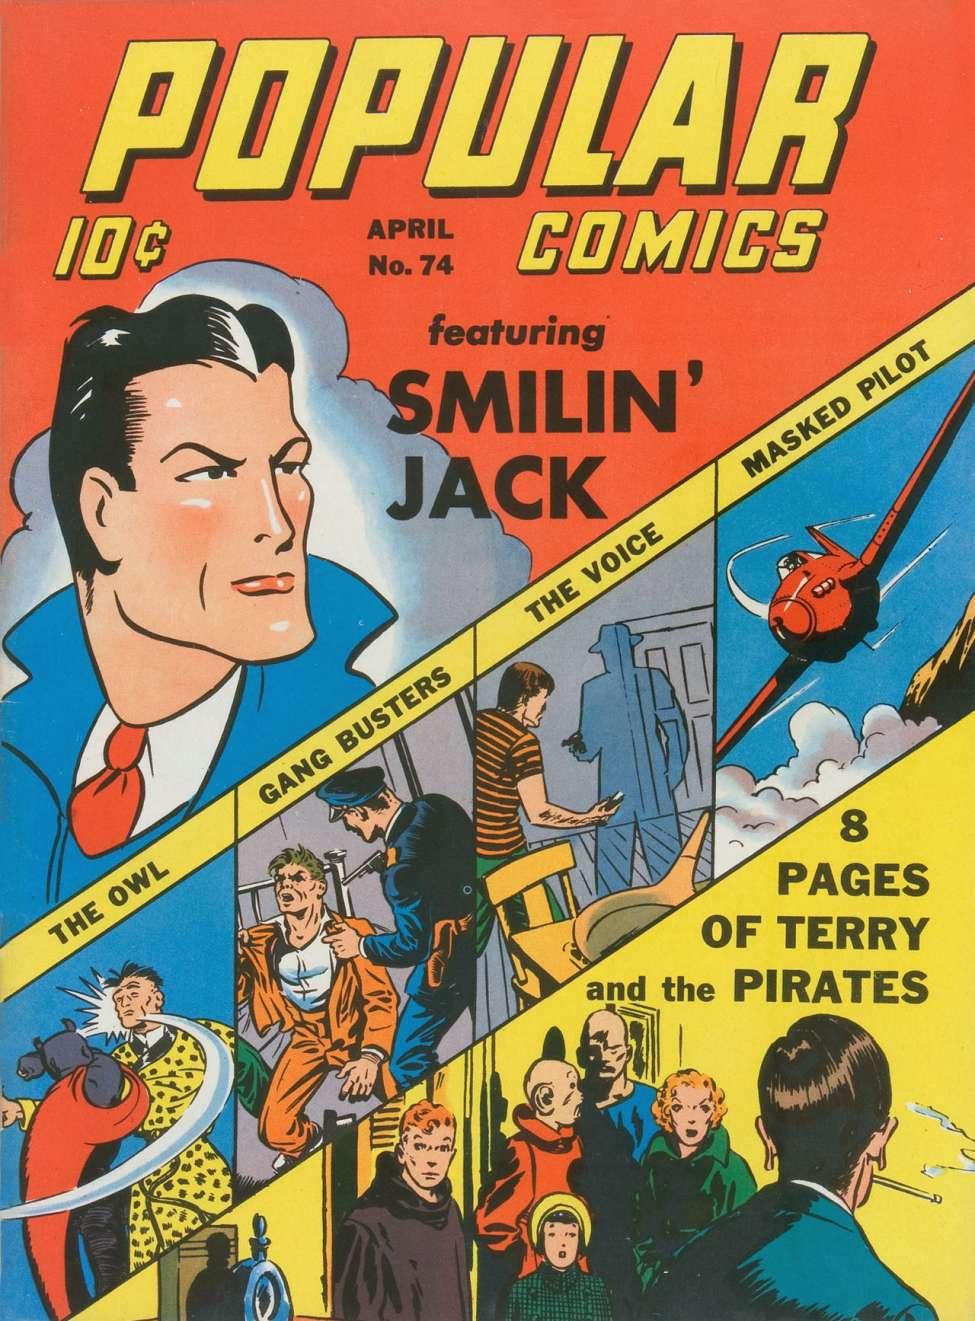 Comic Book Cover For Popular Comics #74